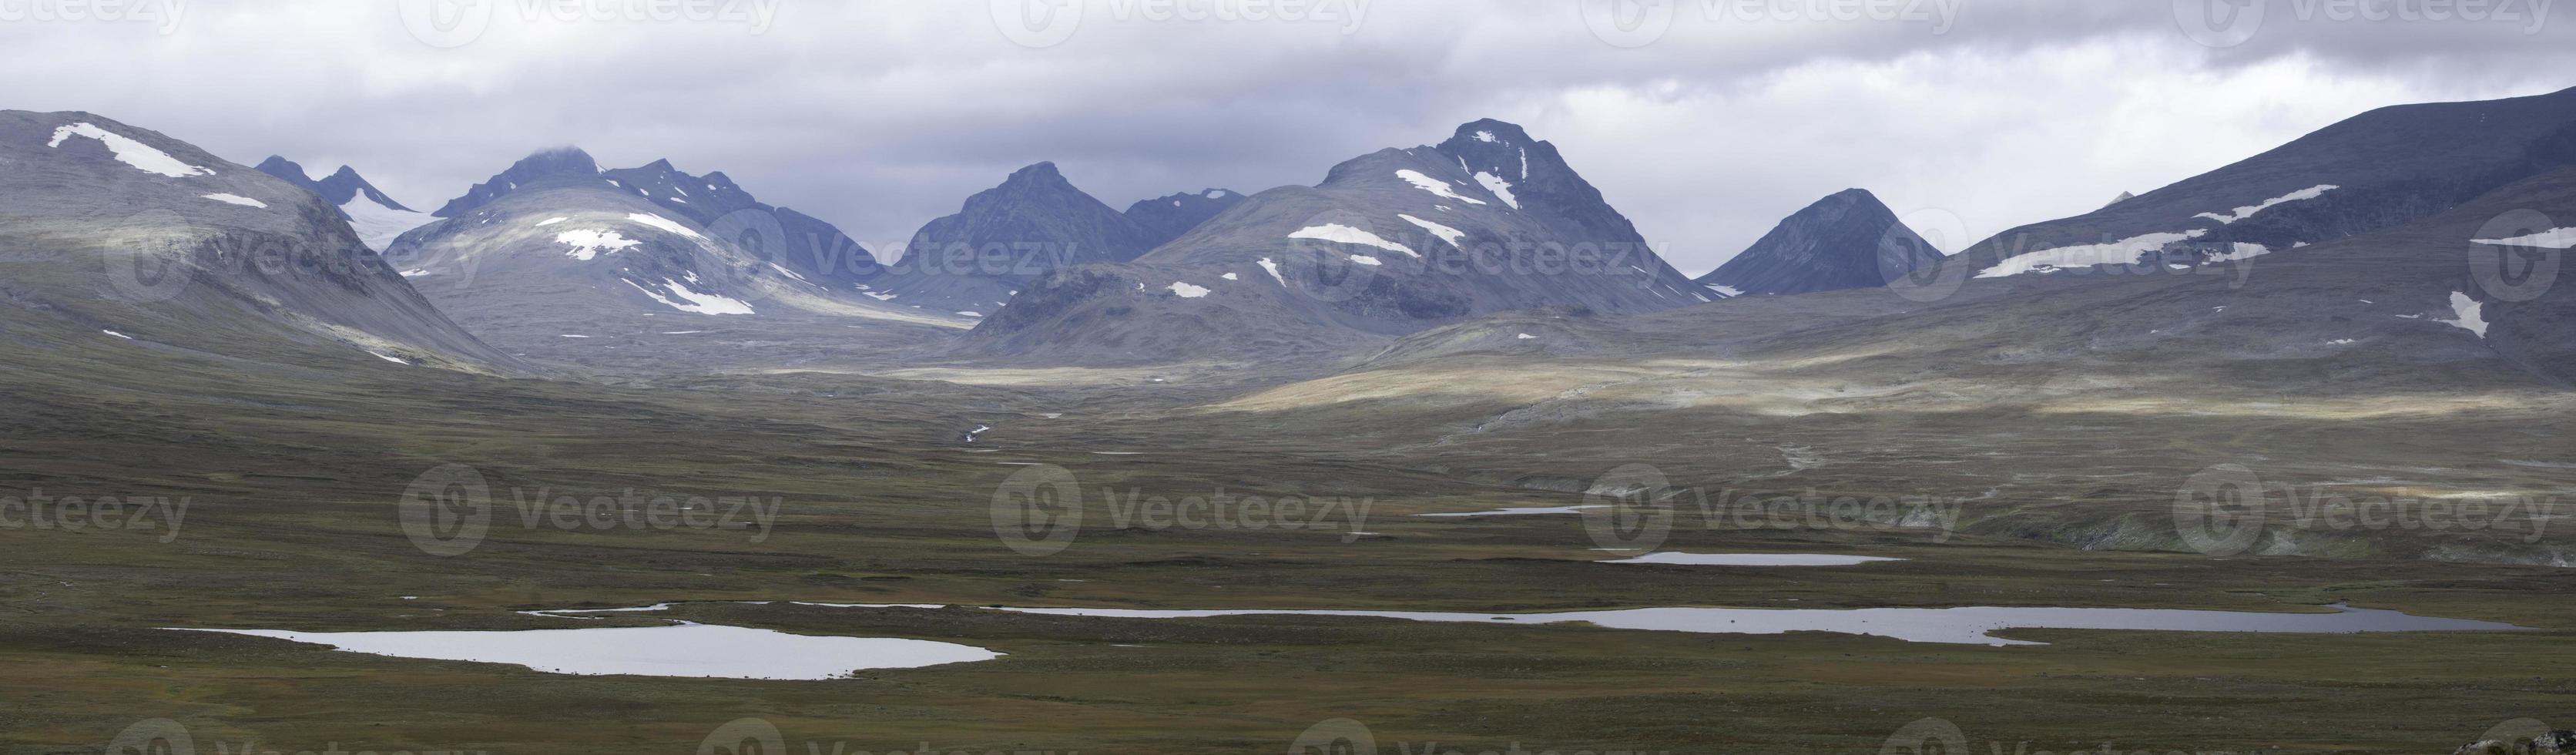 planícies no parque nacional sarek foto